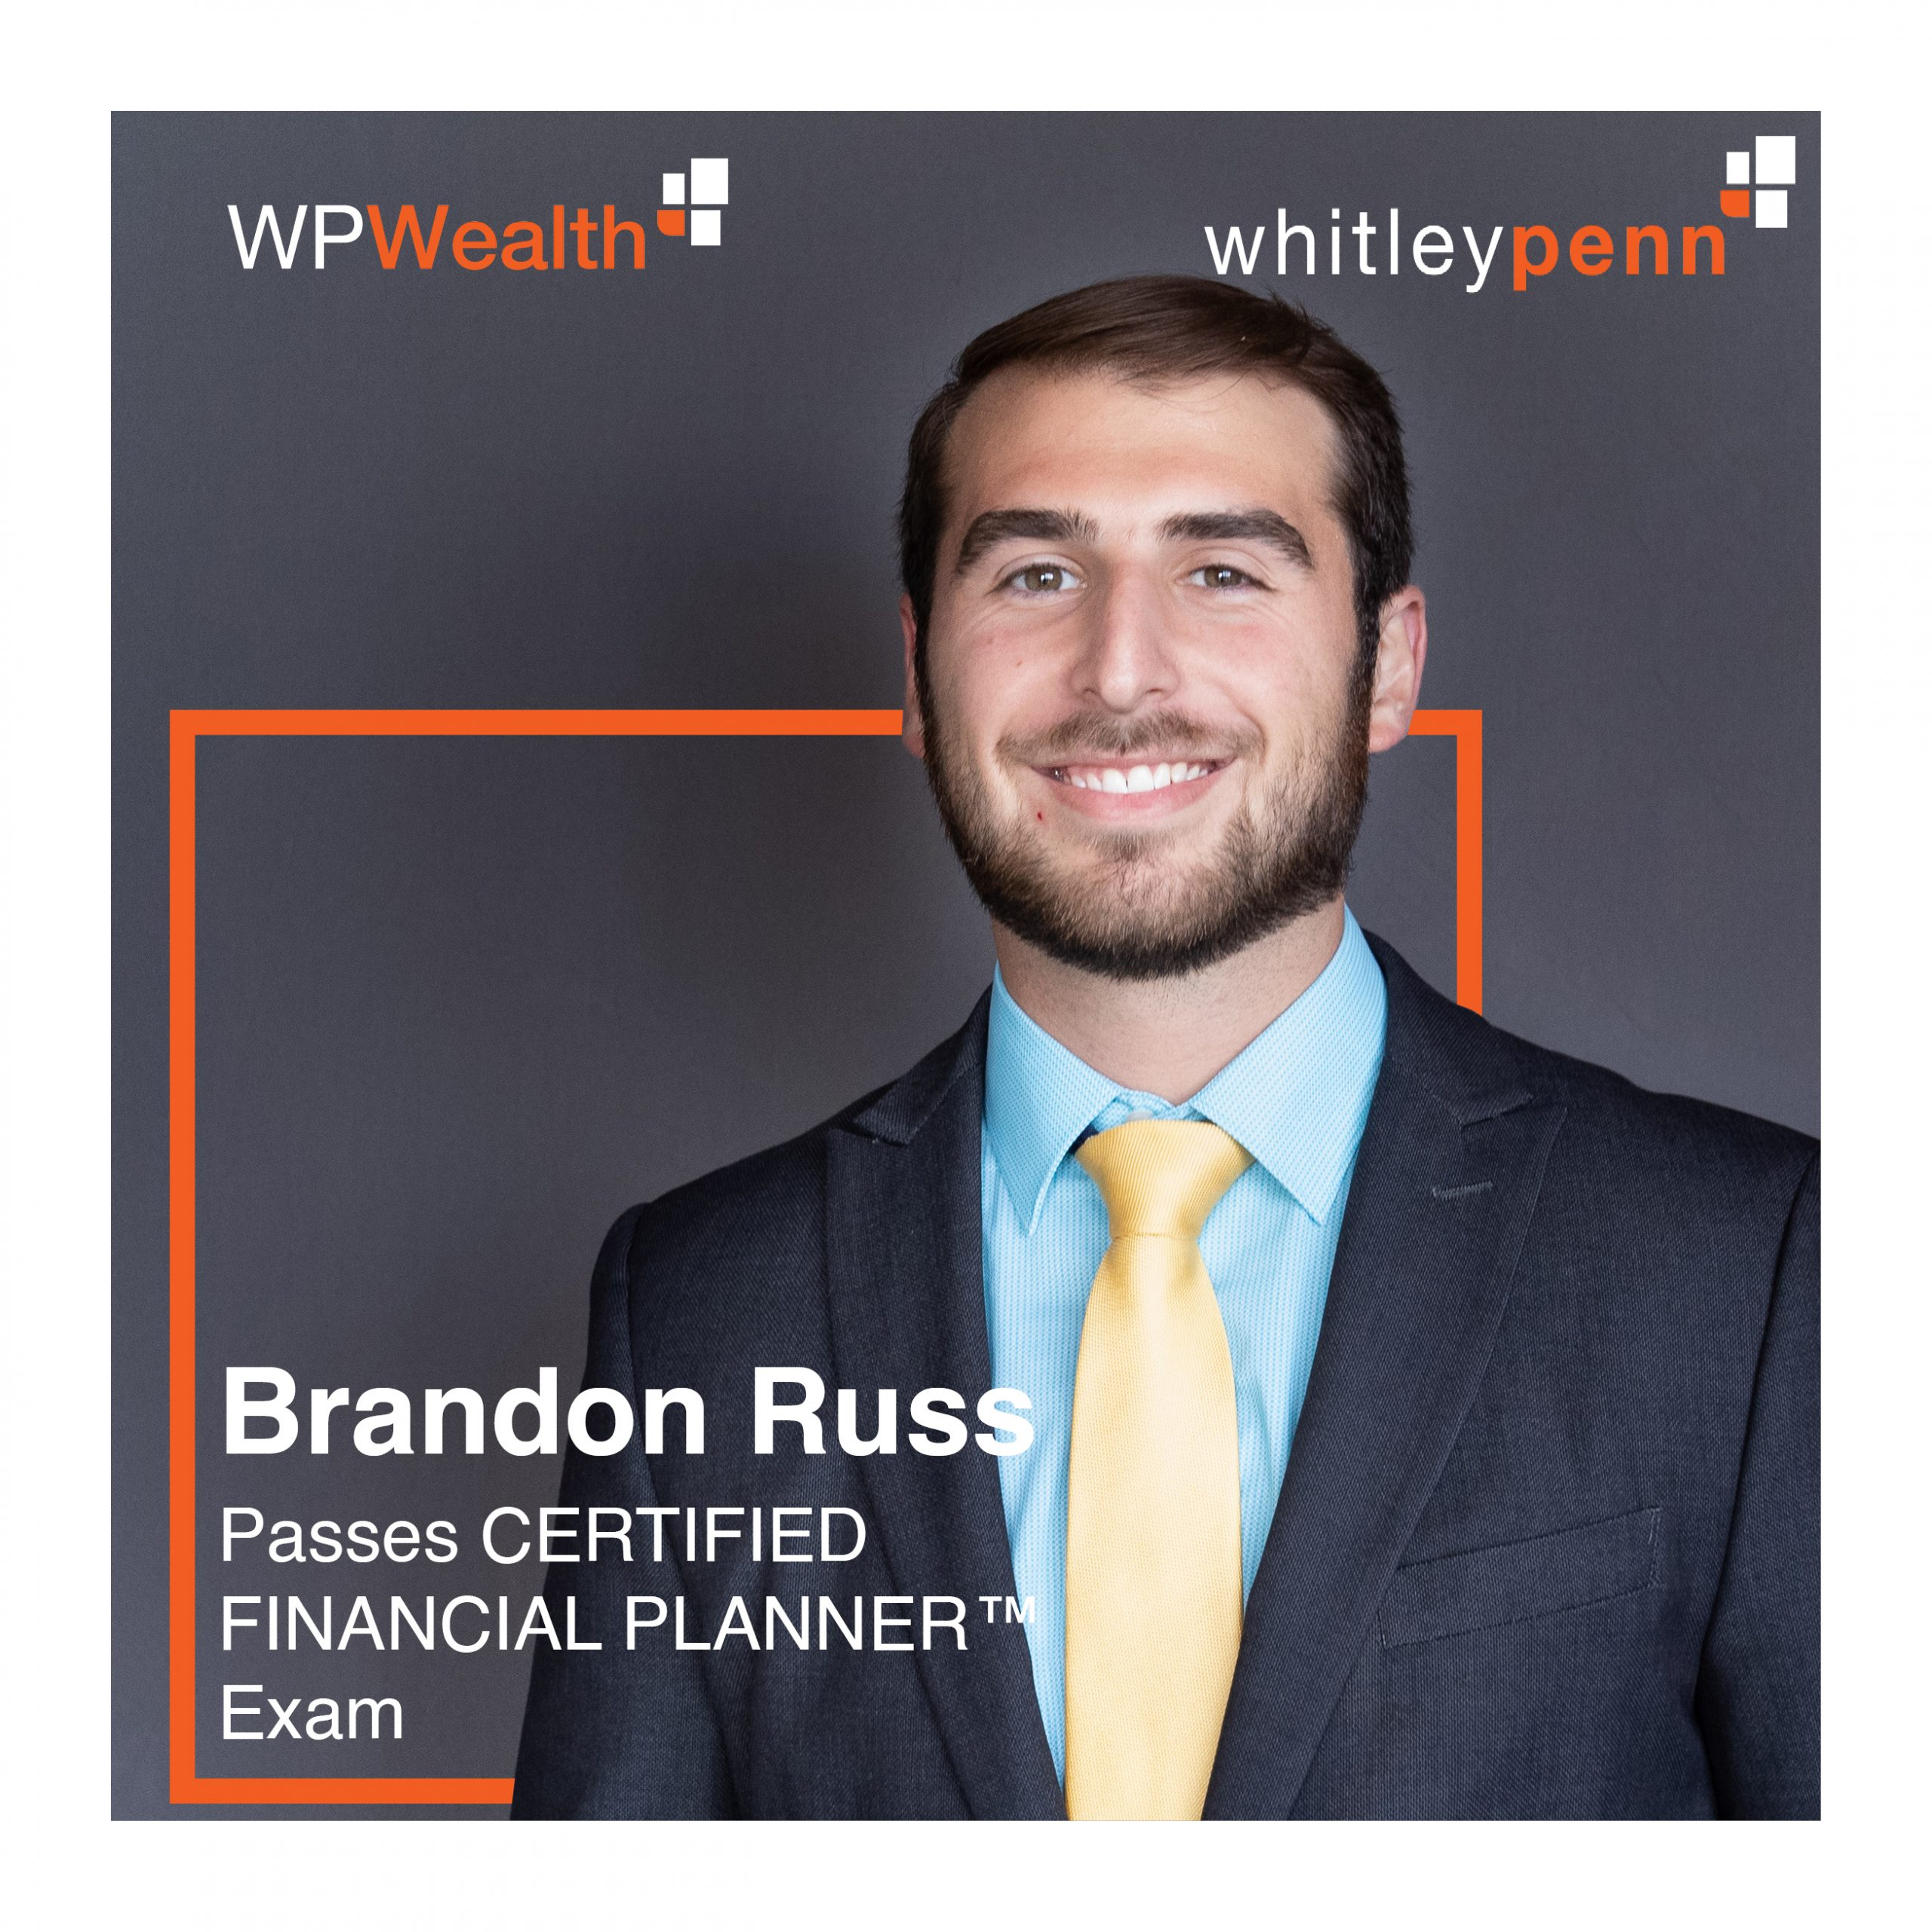 Brandon Russ Certified Financial Planner